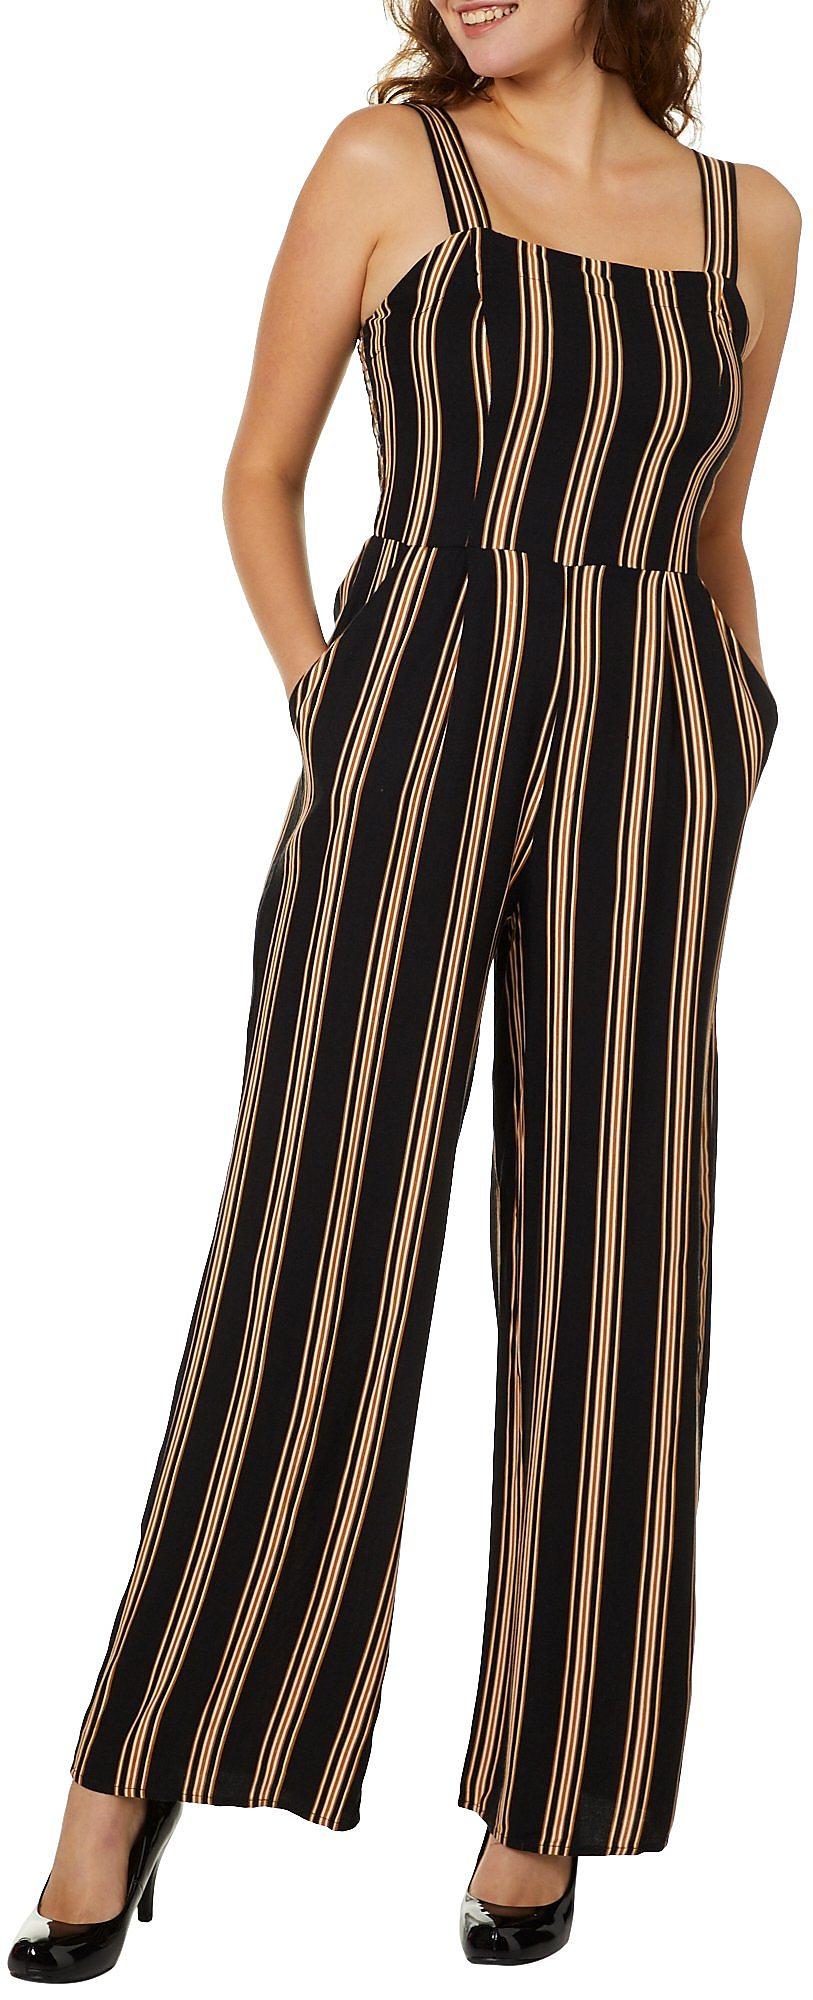 6e3075ad809b Be Bop Juniors Striped Wide Leg Jumpsuit Large Black yellow white ...